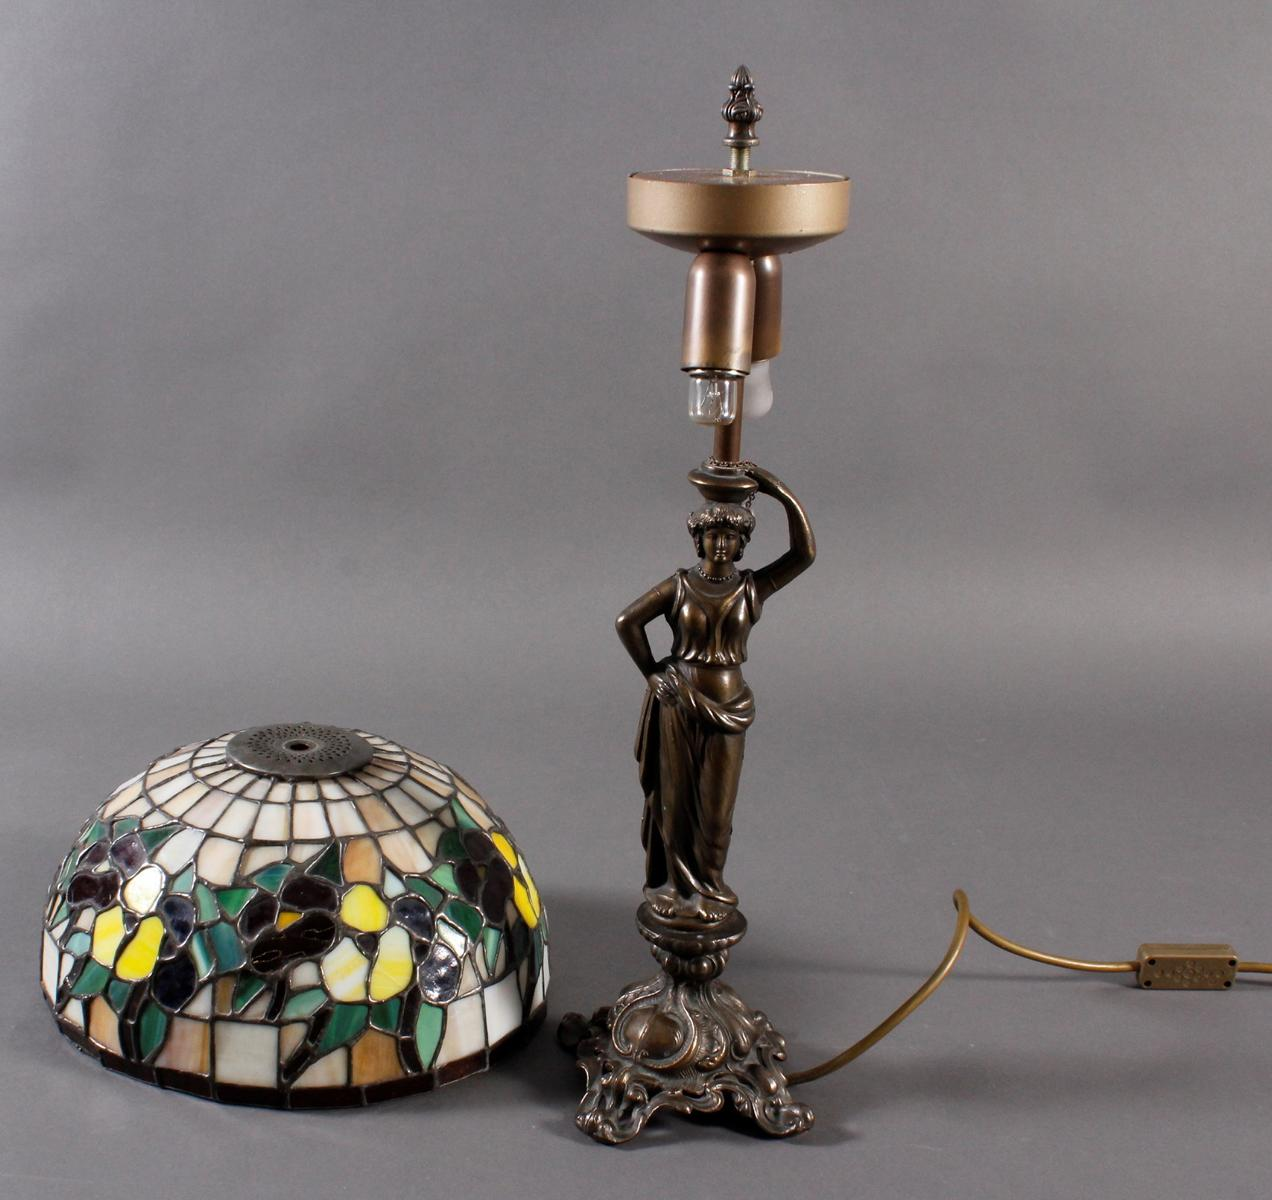 Tischlampe im Tiffany-Stil, 2. Hälfte 20. Jh.-2